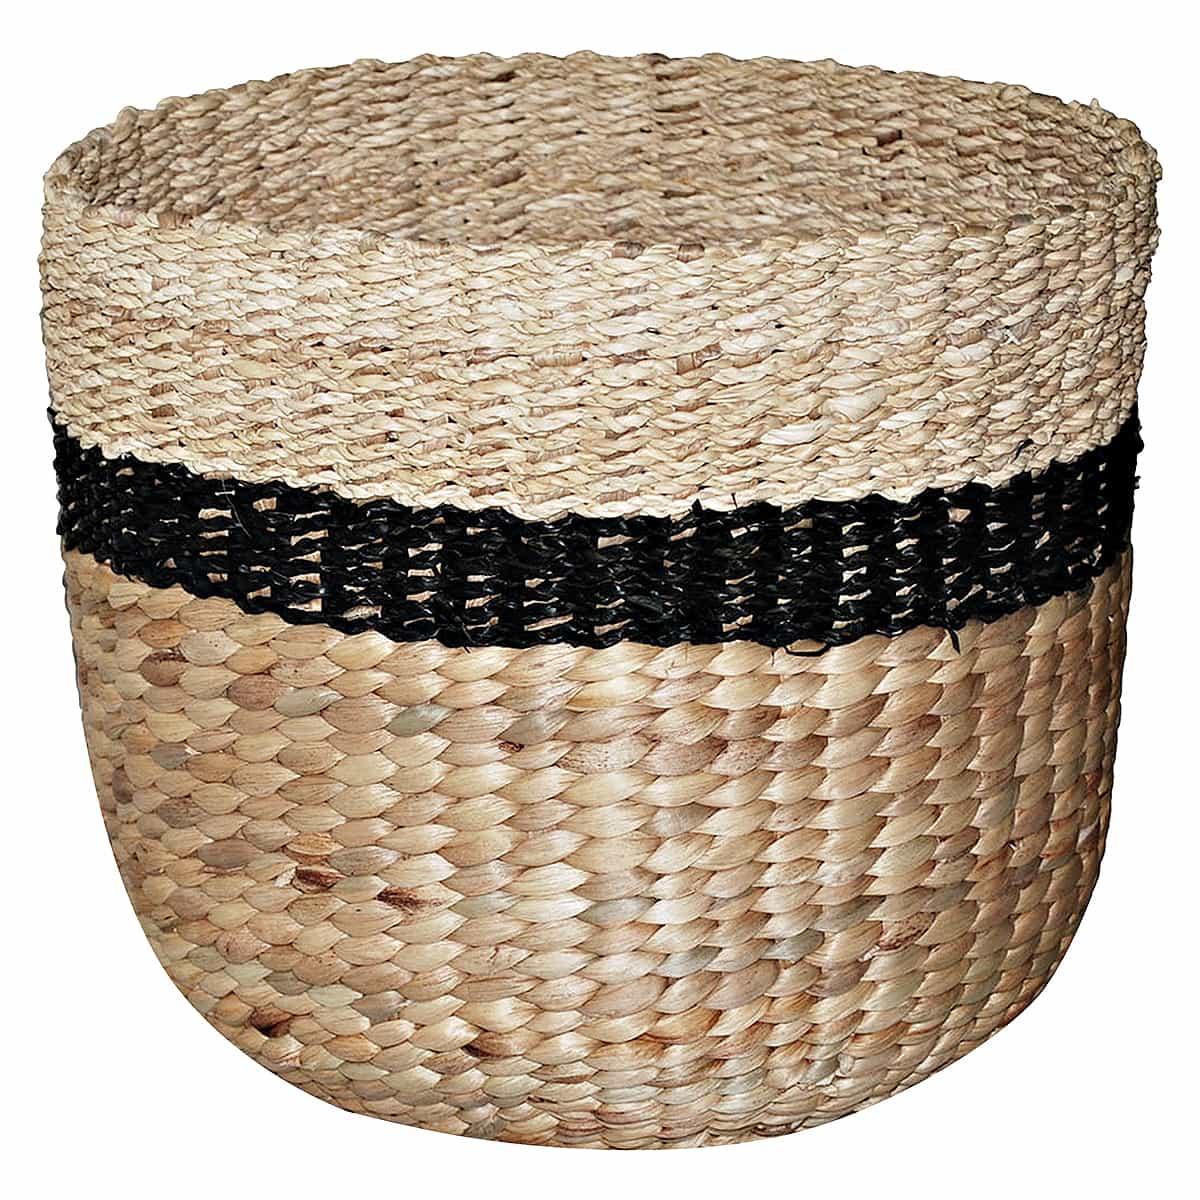 Threshold woven basket